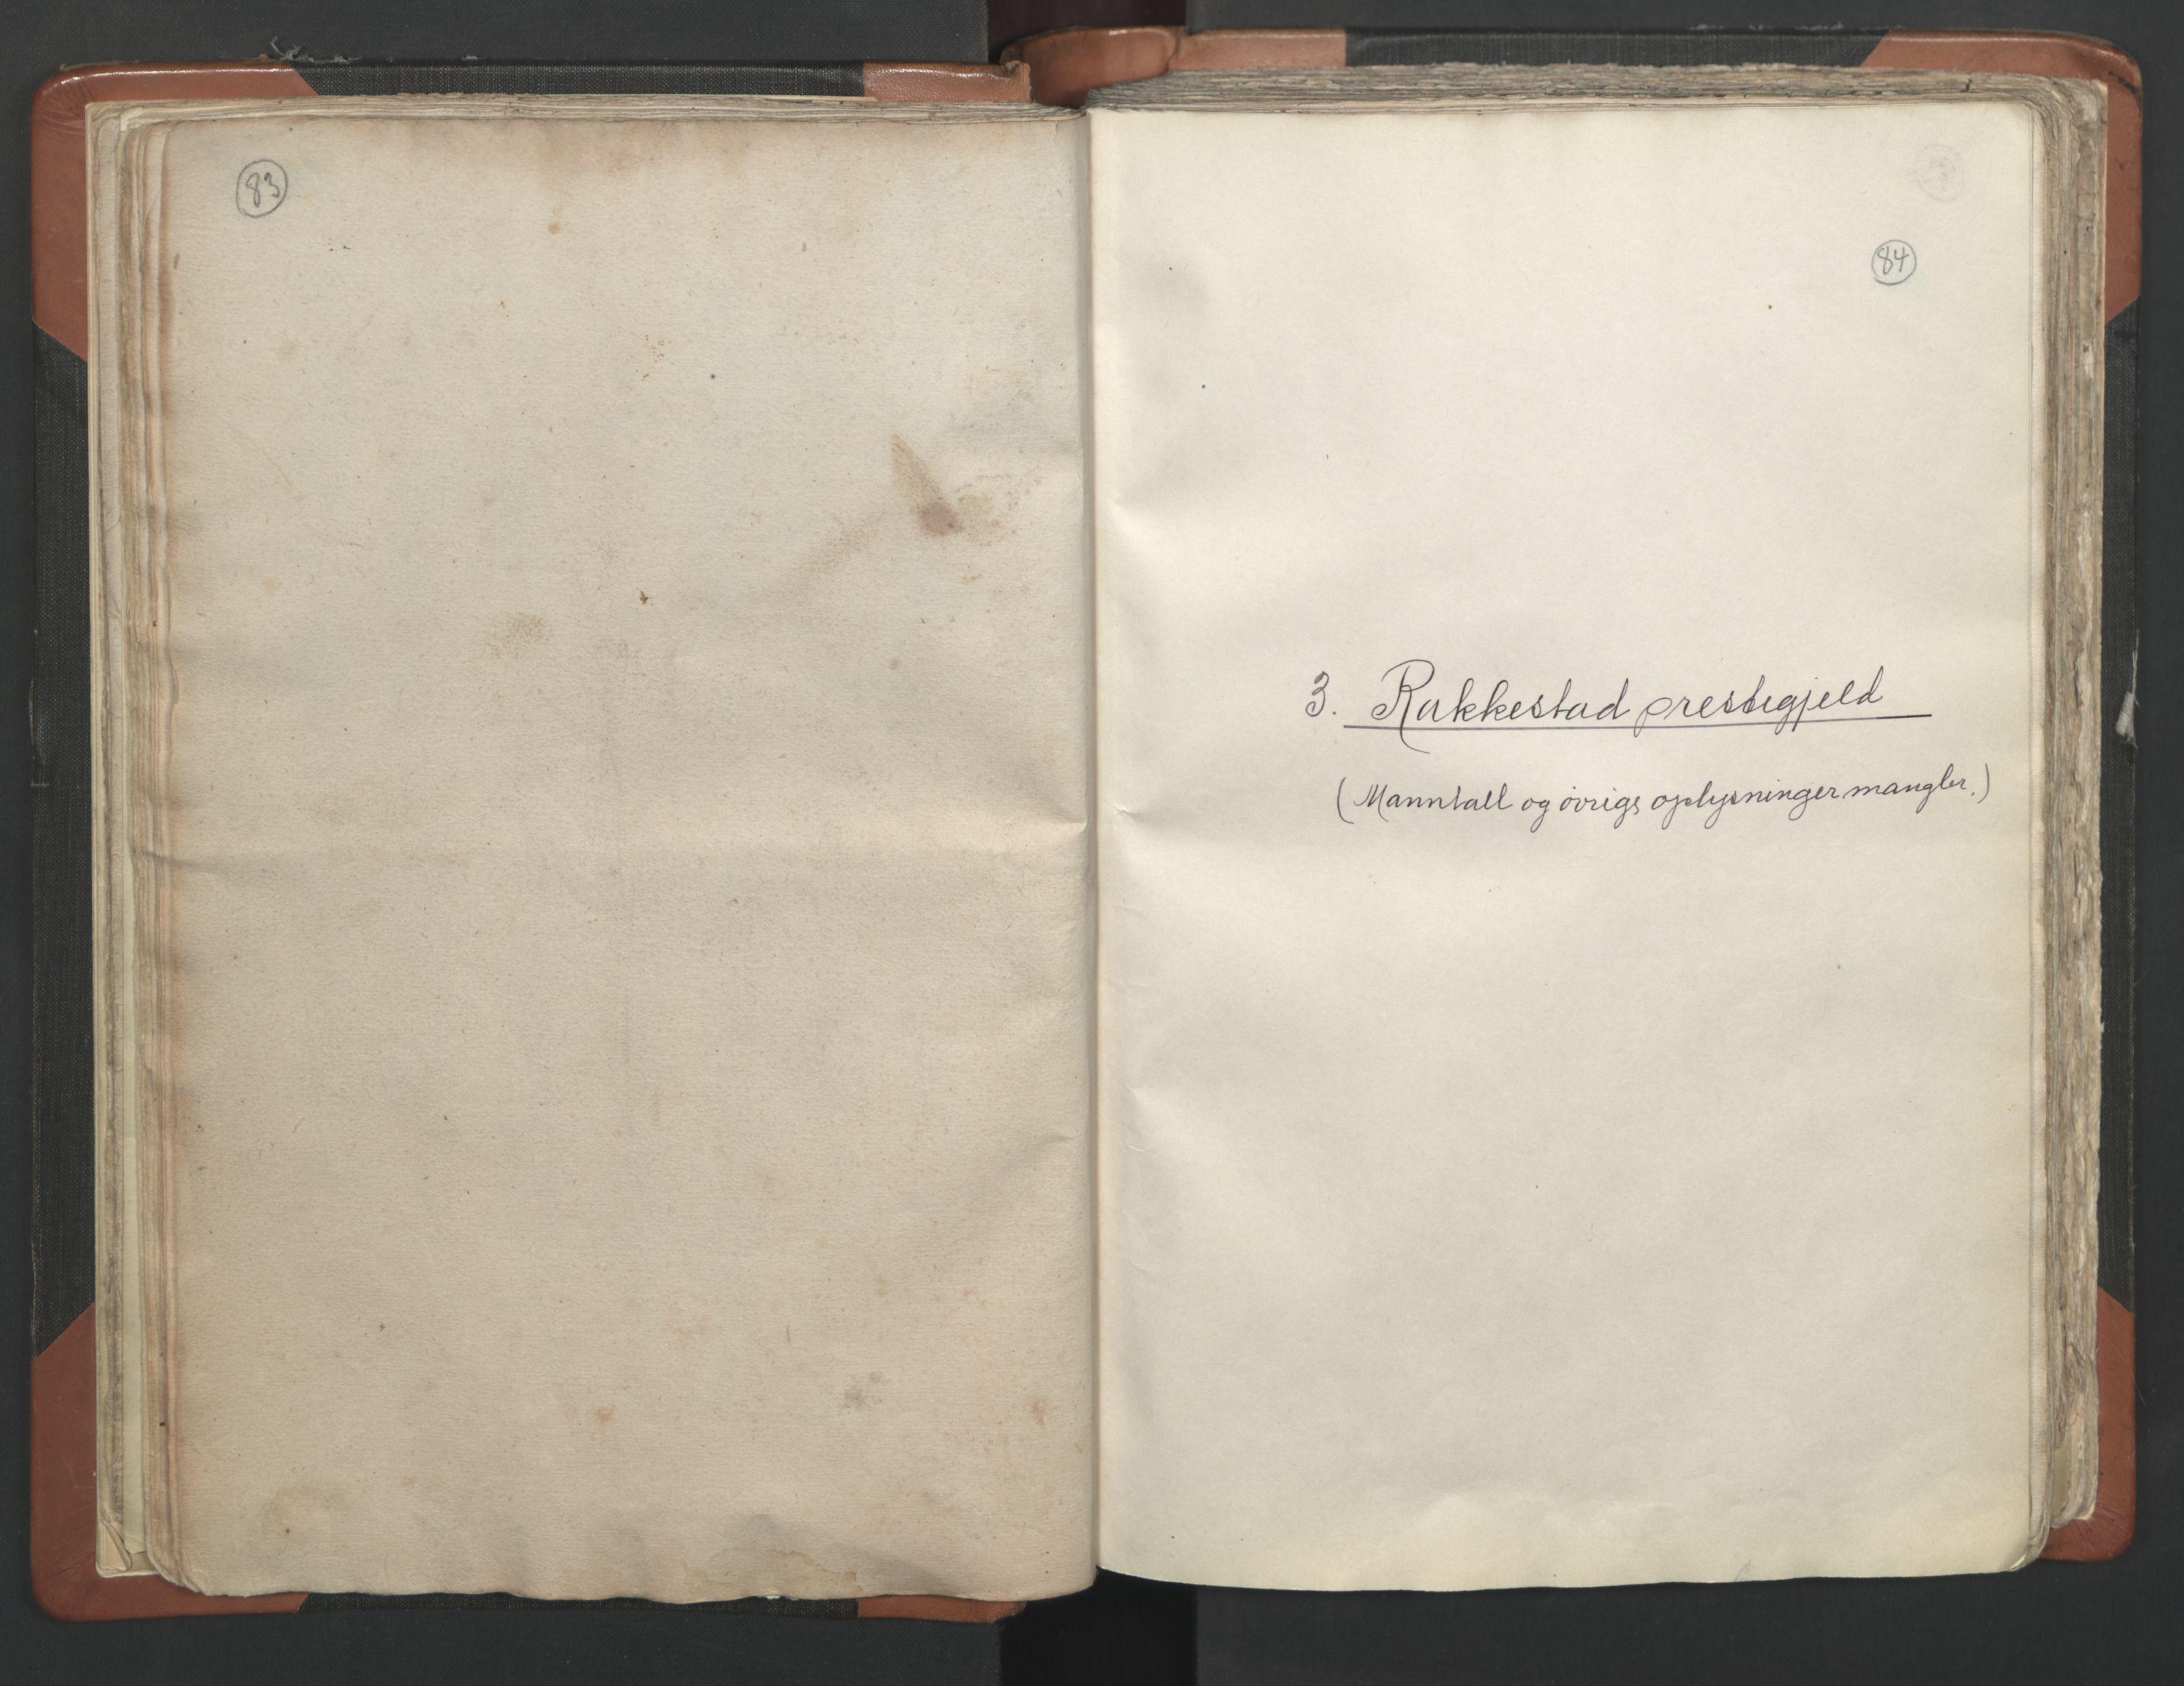 RA, Vicar's Census 1664-1666, no. 2: Øvre Borgesyssel deanery, 1664-1666, p. 83-84